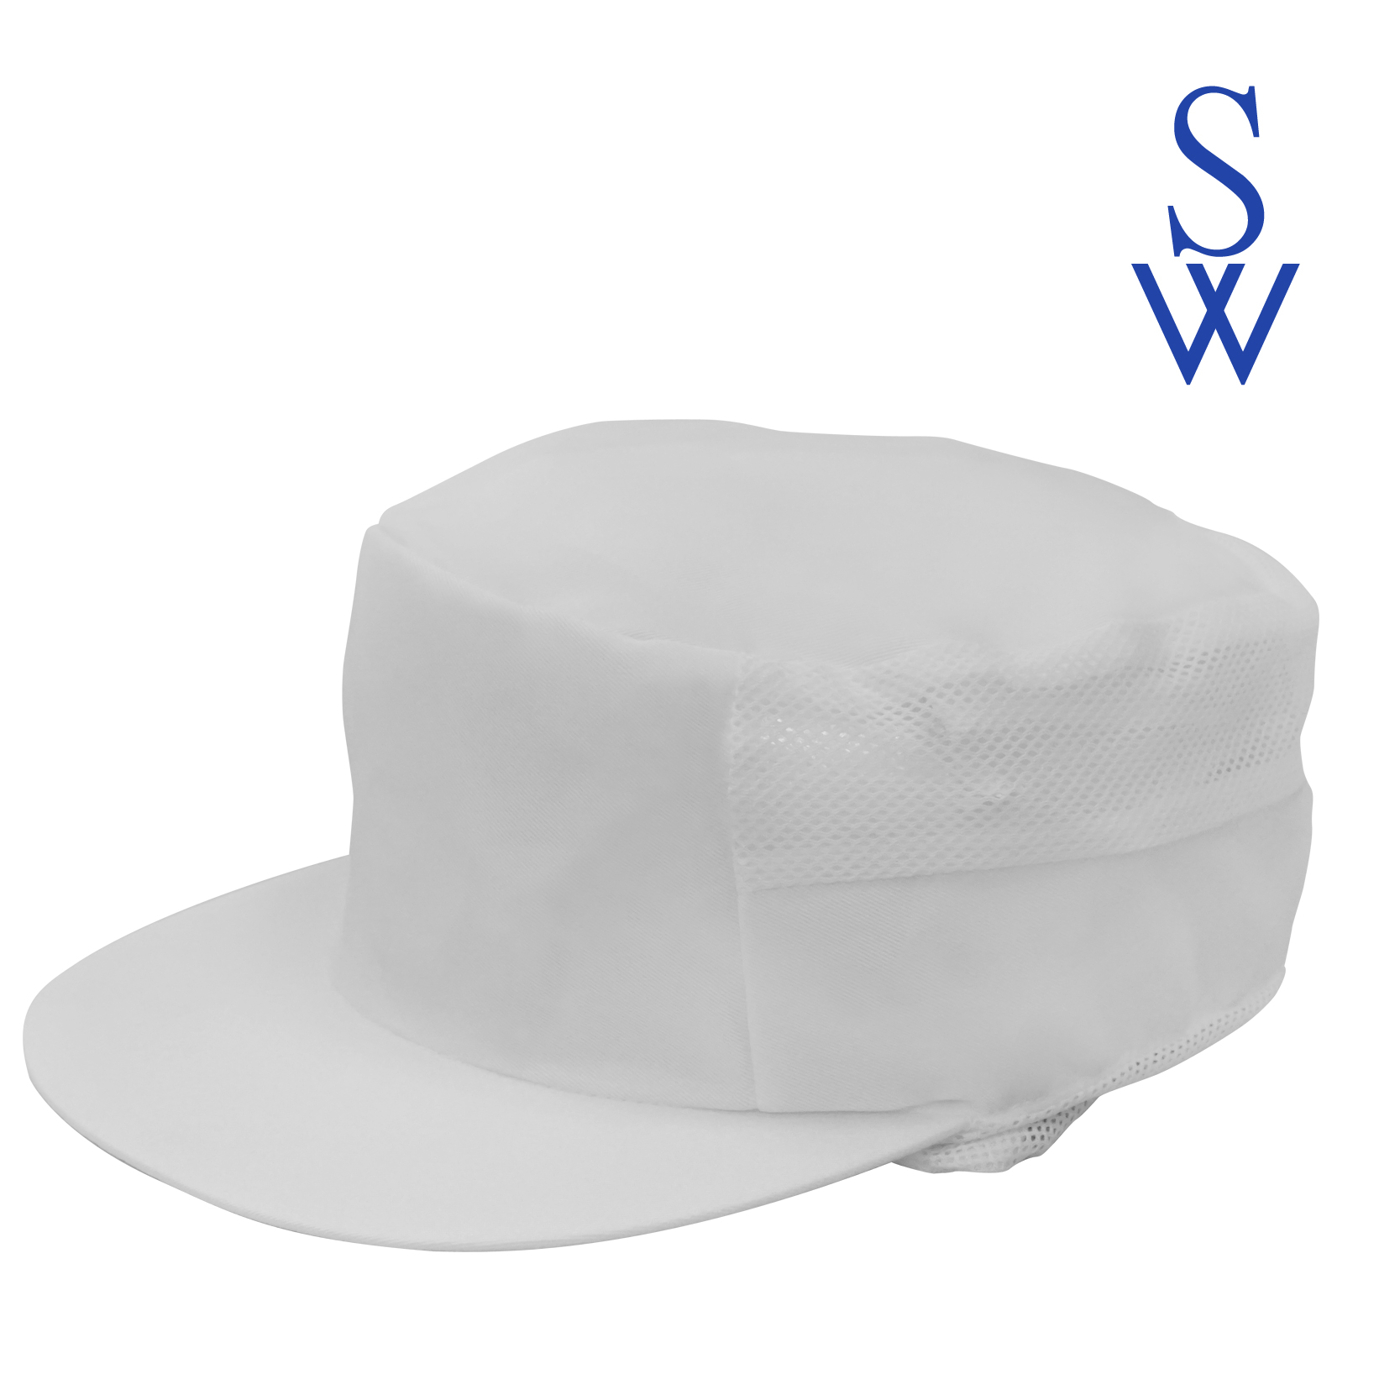 【WS 緯成】食品網帽 / Chef Coat 廚師服